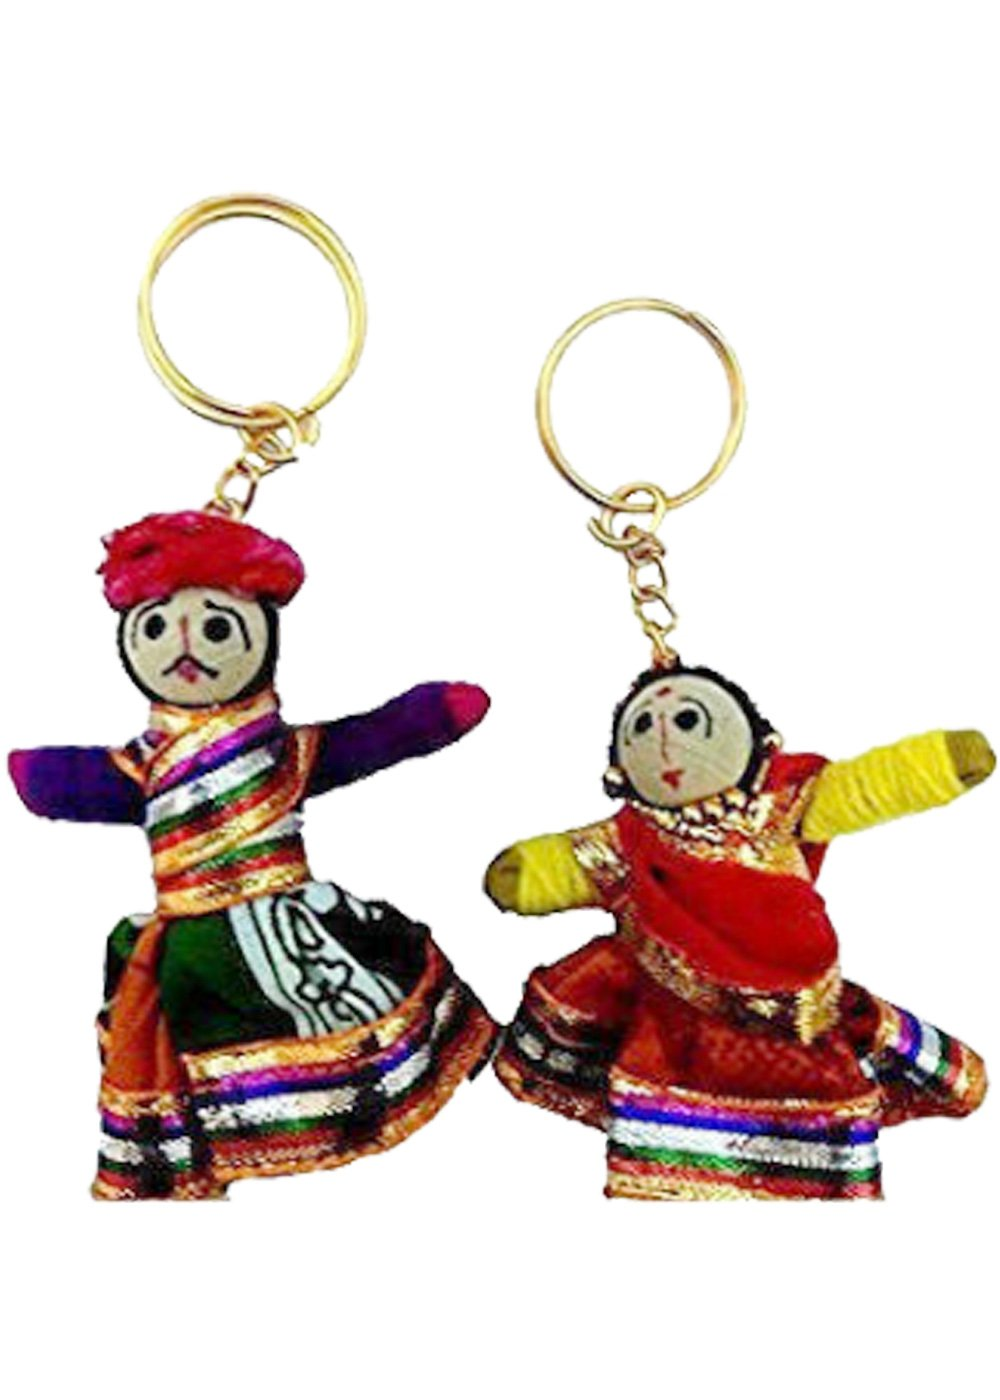 Handmade Puppets Keychain